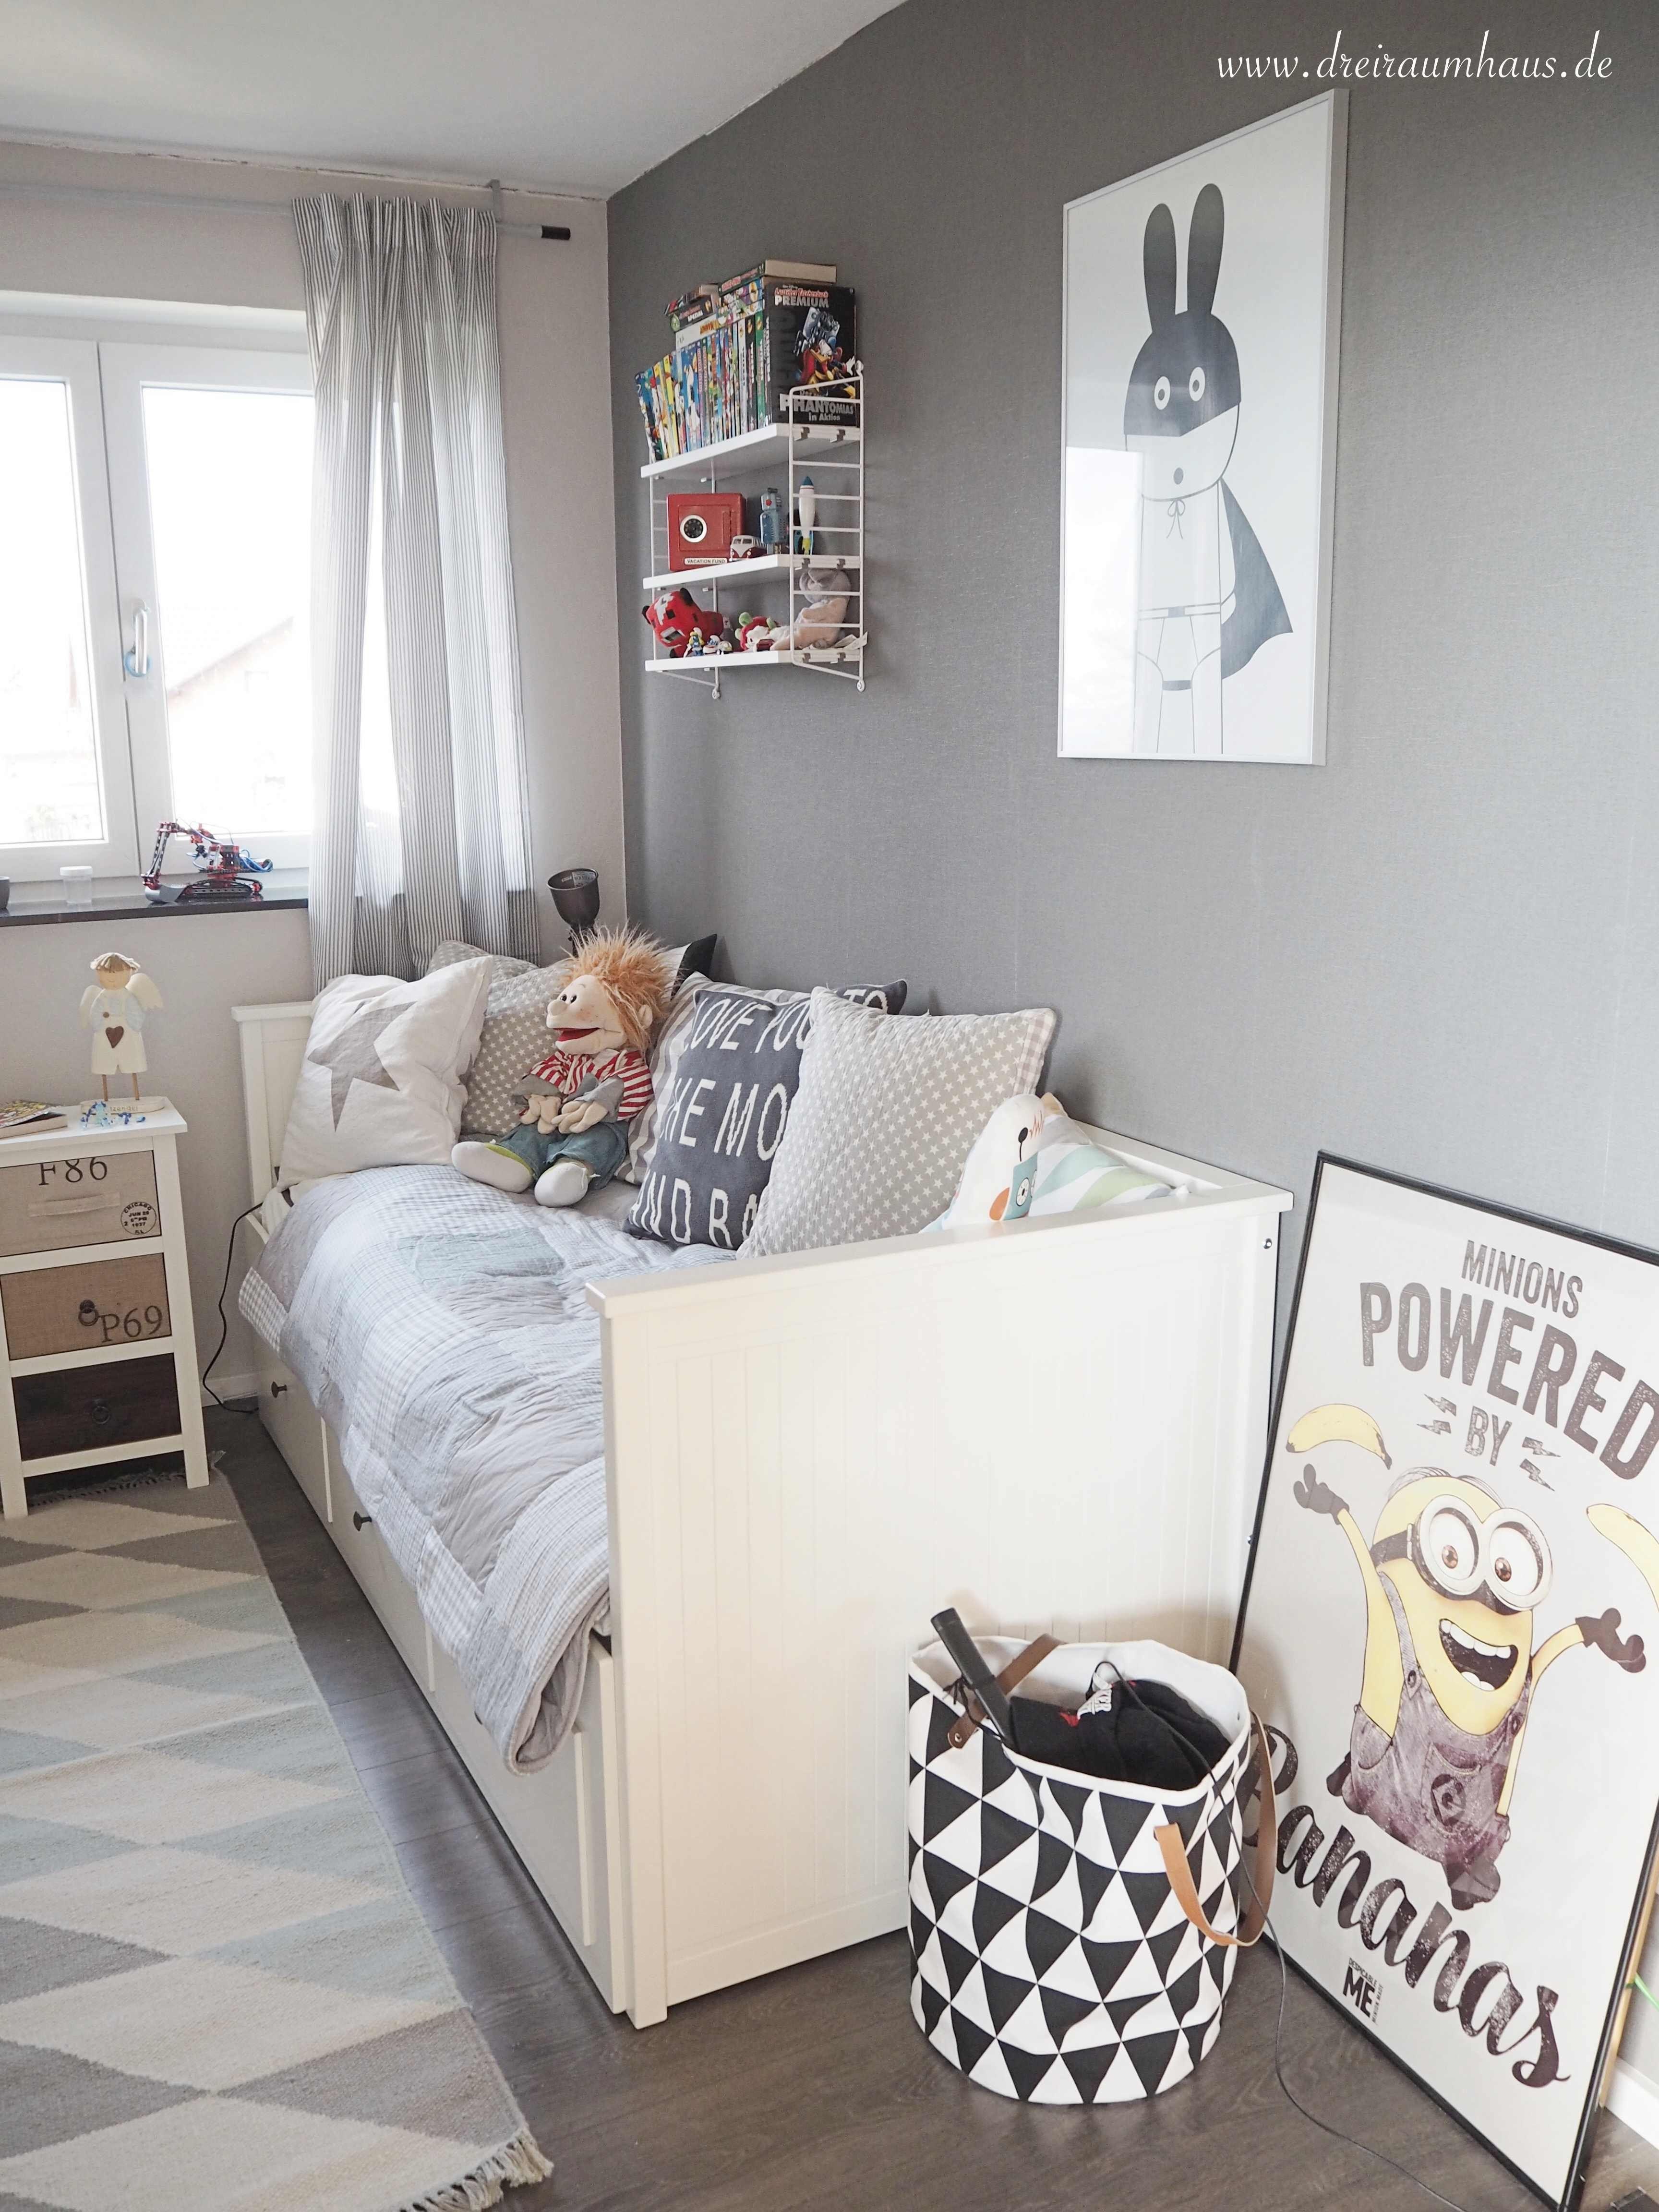 Kreative Wandgestaltung Kinderzimmer Kreative Wohnideen Fur